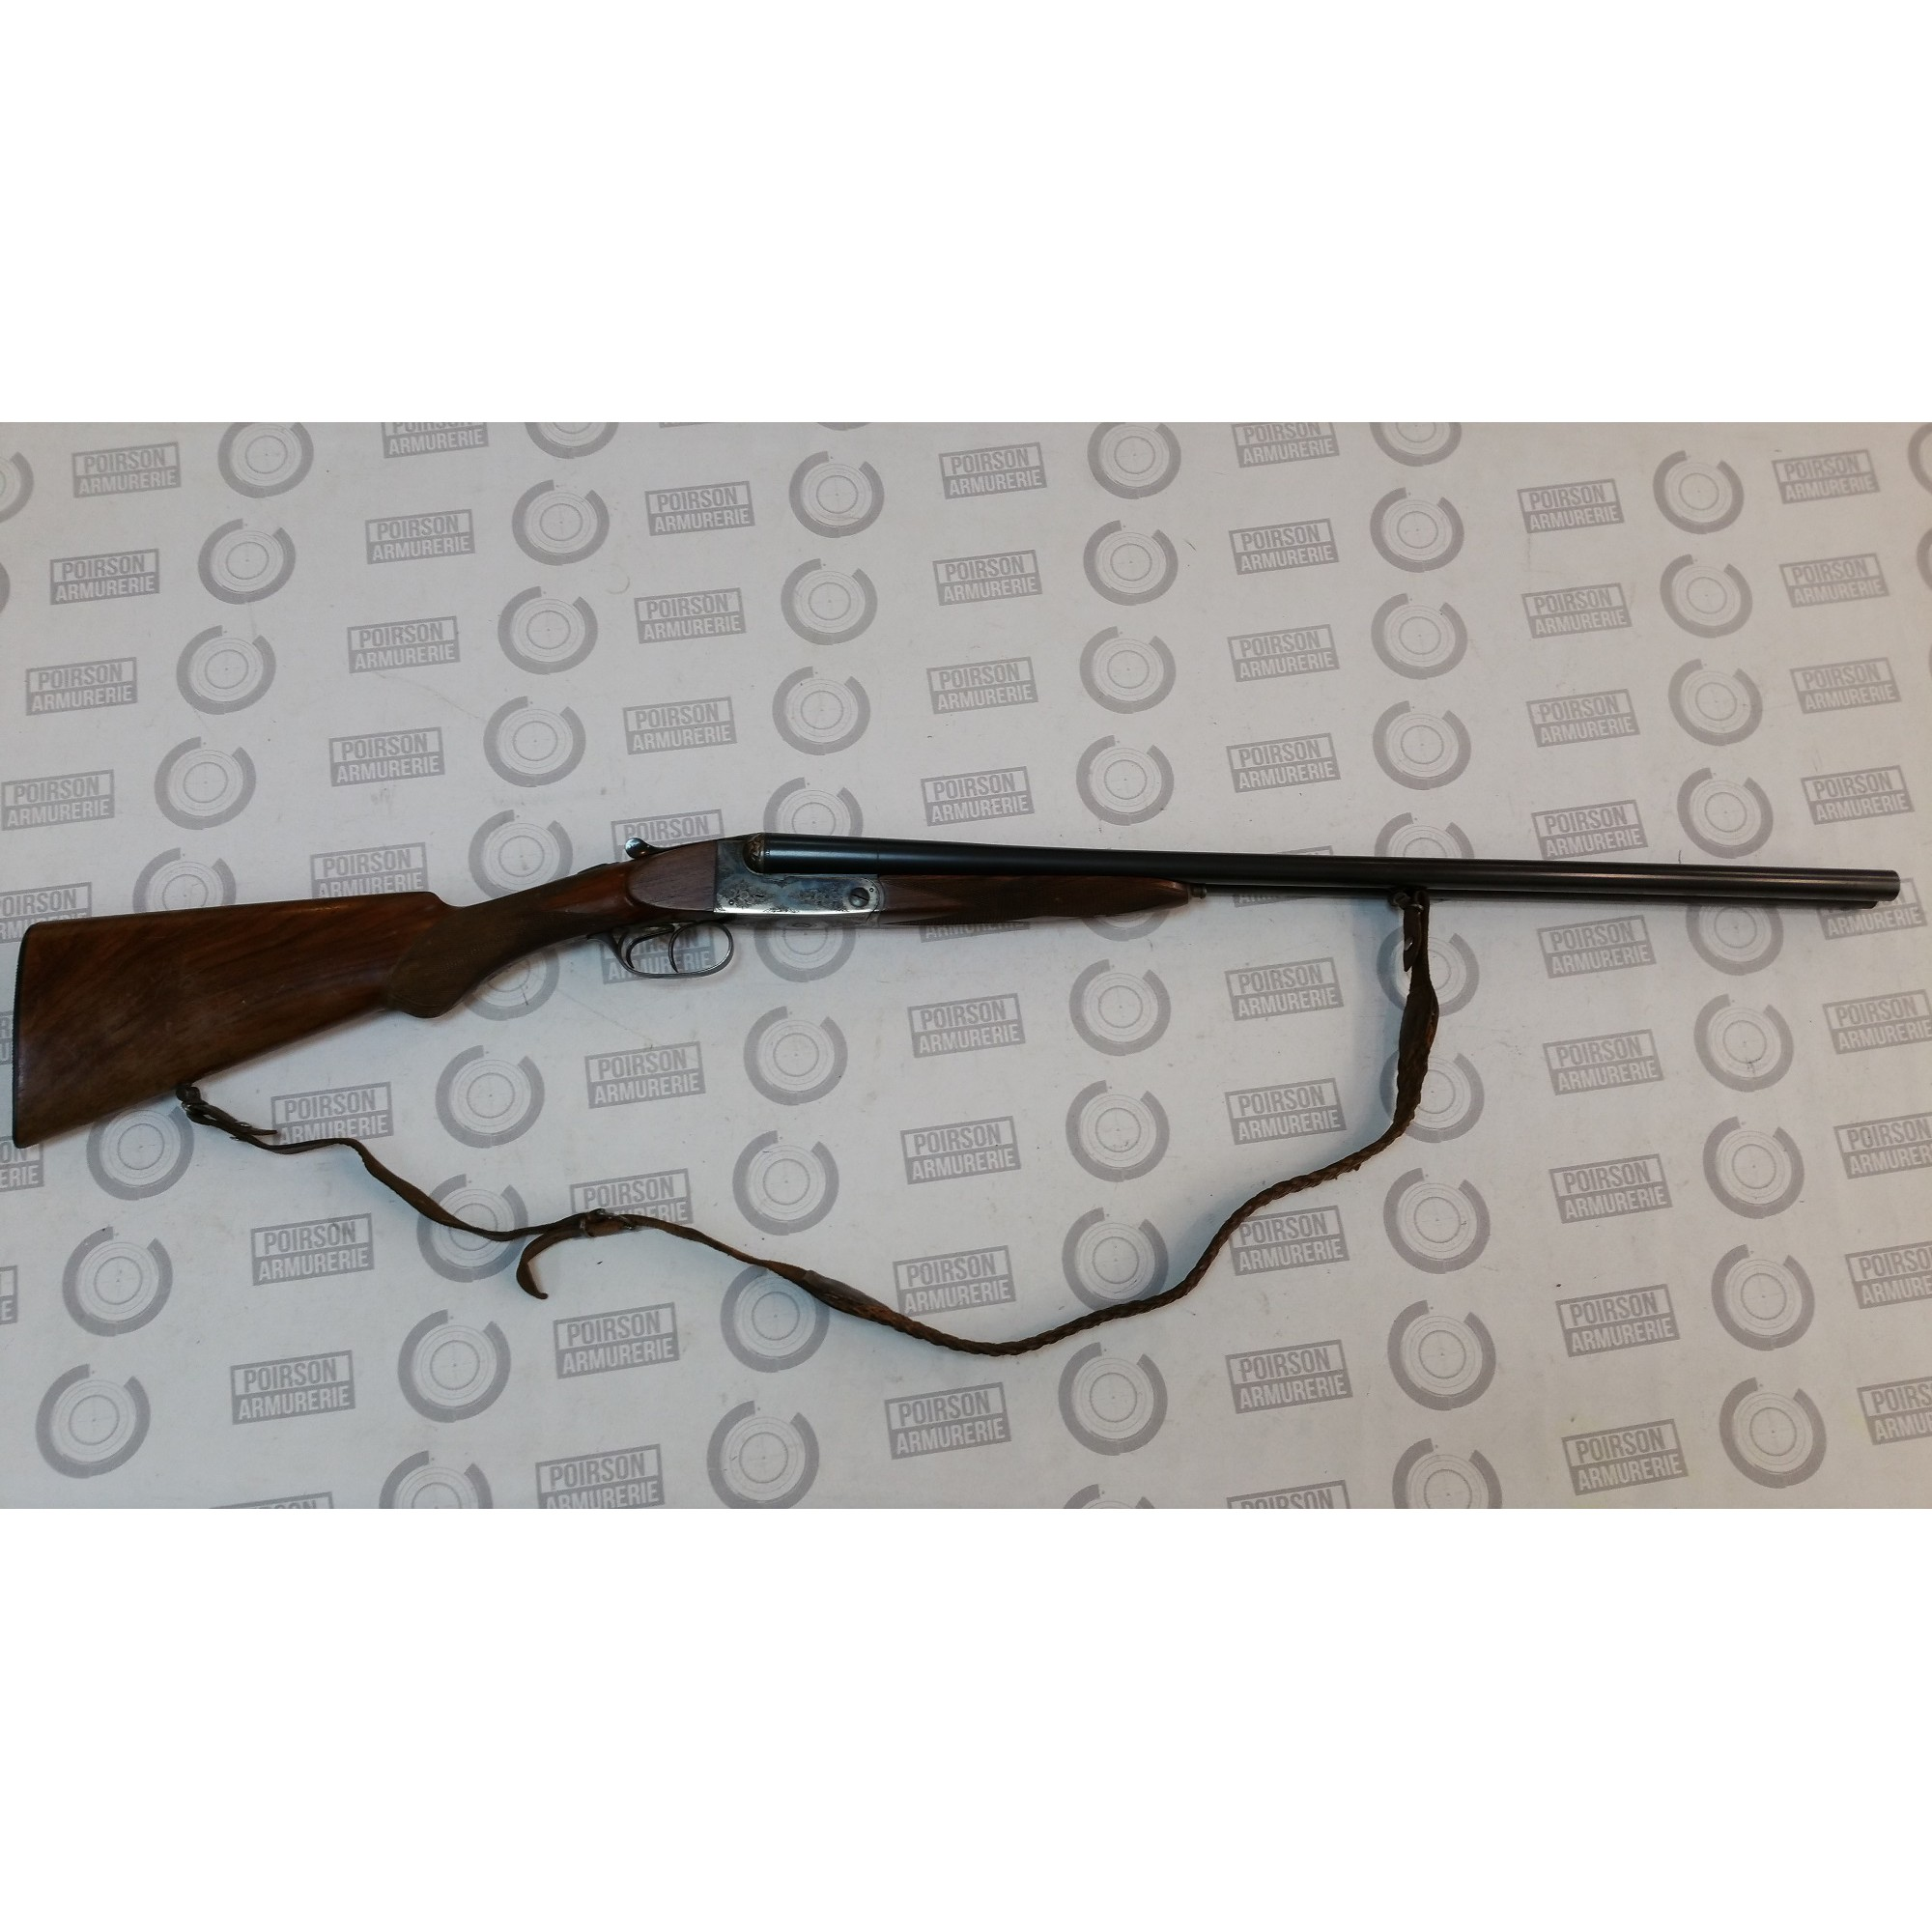 c365e053b72 Fusil MAS juxtaposé calibre 16 65 - Occasion